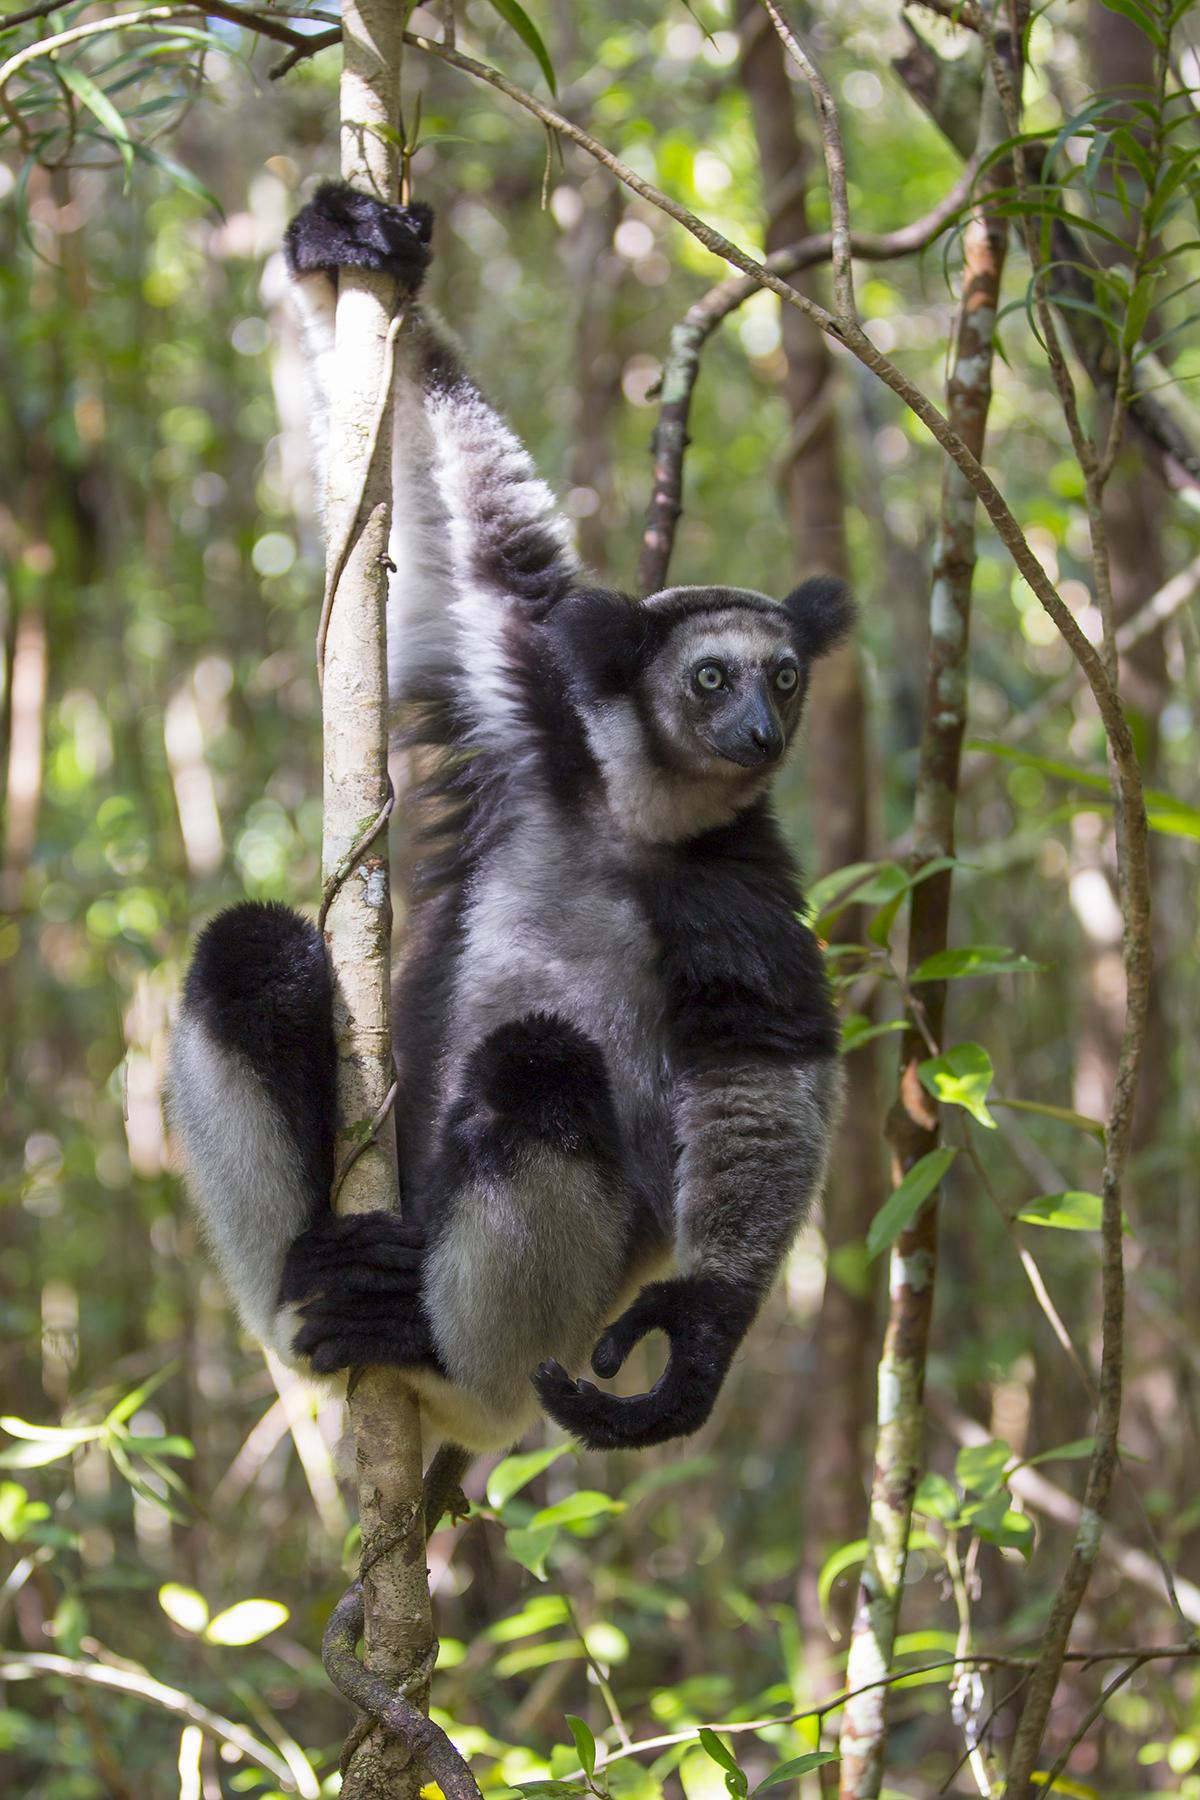 Indri   Indri indri   Canon 5 d III  2,8/70 mm  1/30 sec  Iso 100  Madagaskar  8:33 Uhr